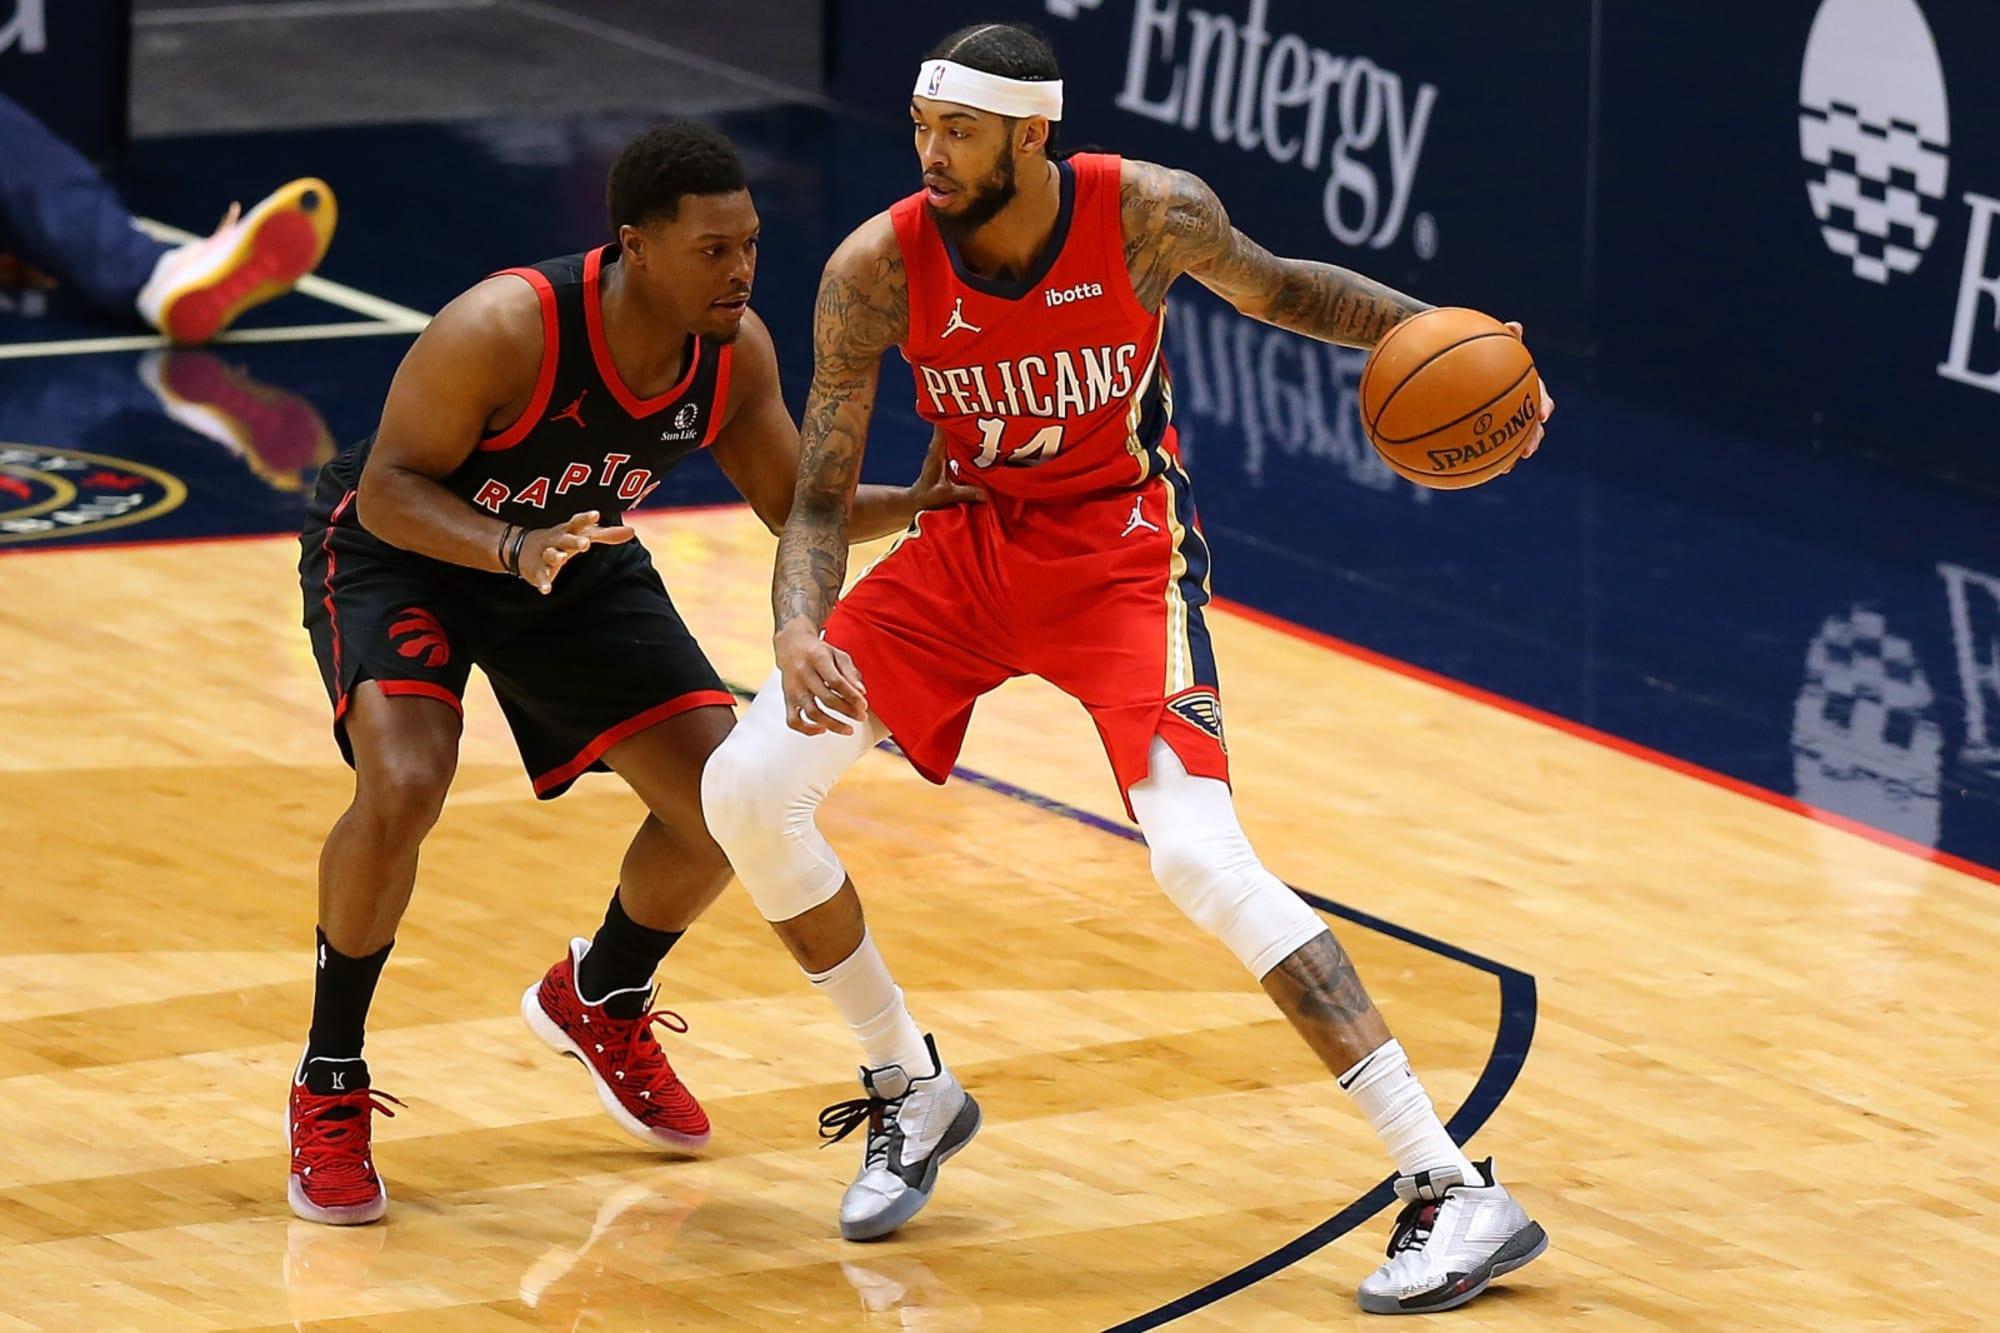 Raptors rumors: Pelicans open up space for Kyle Lowry after huge trade